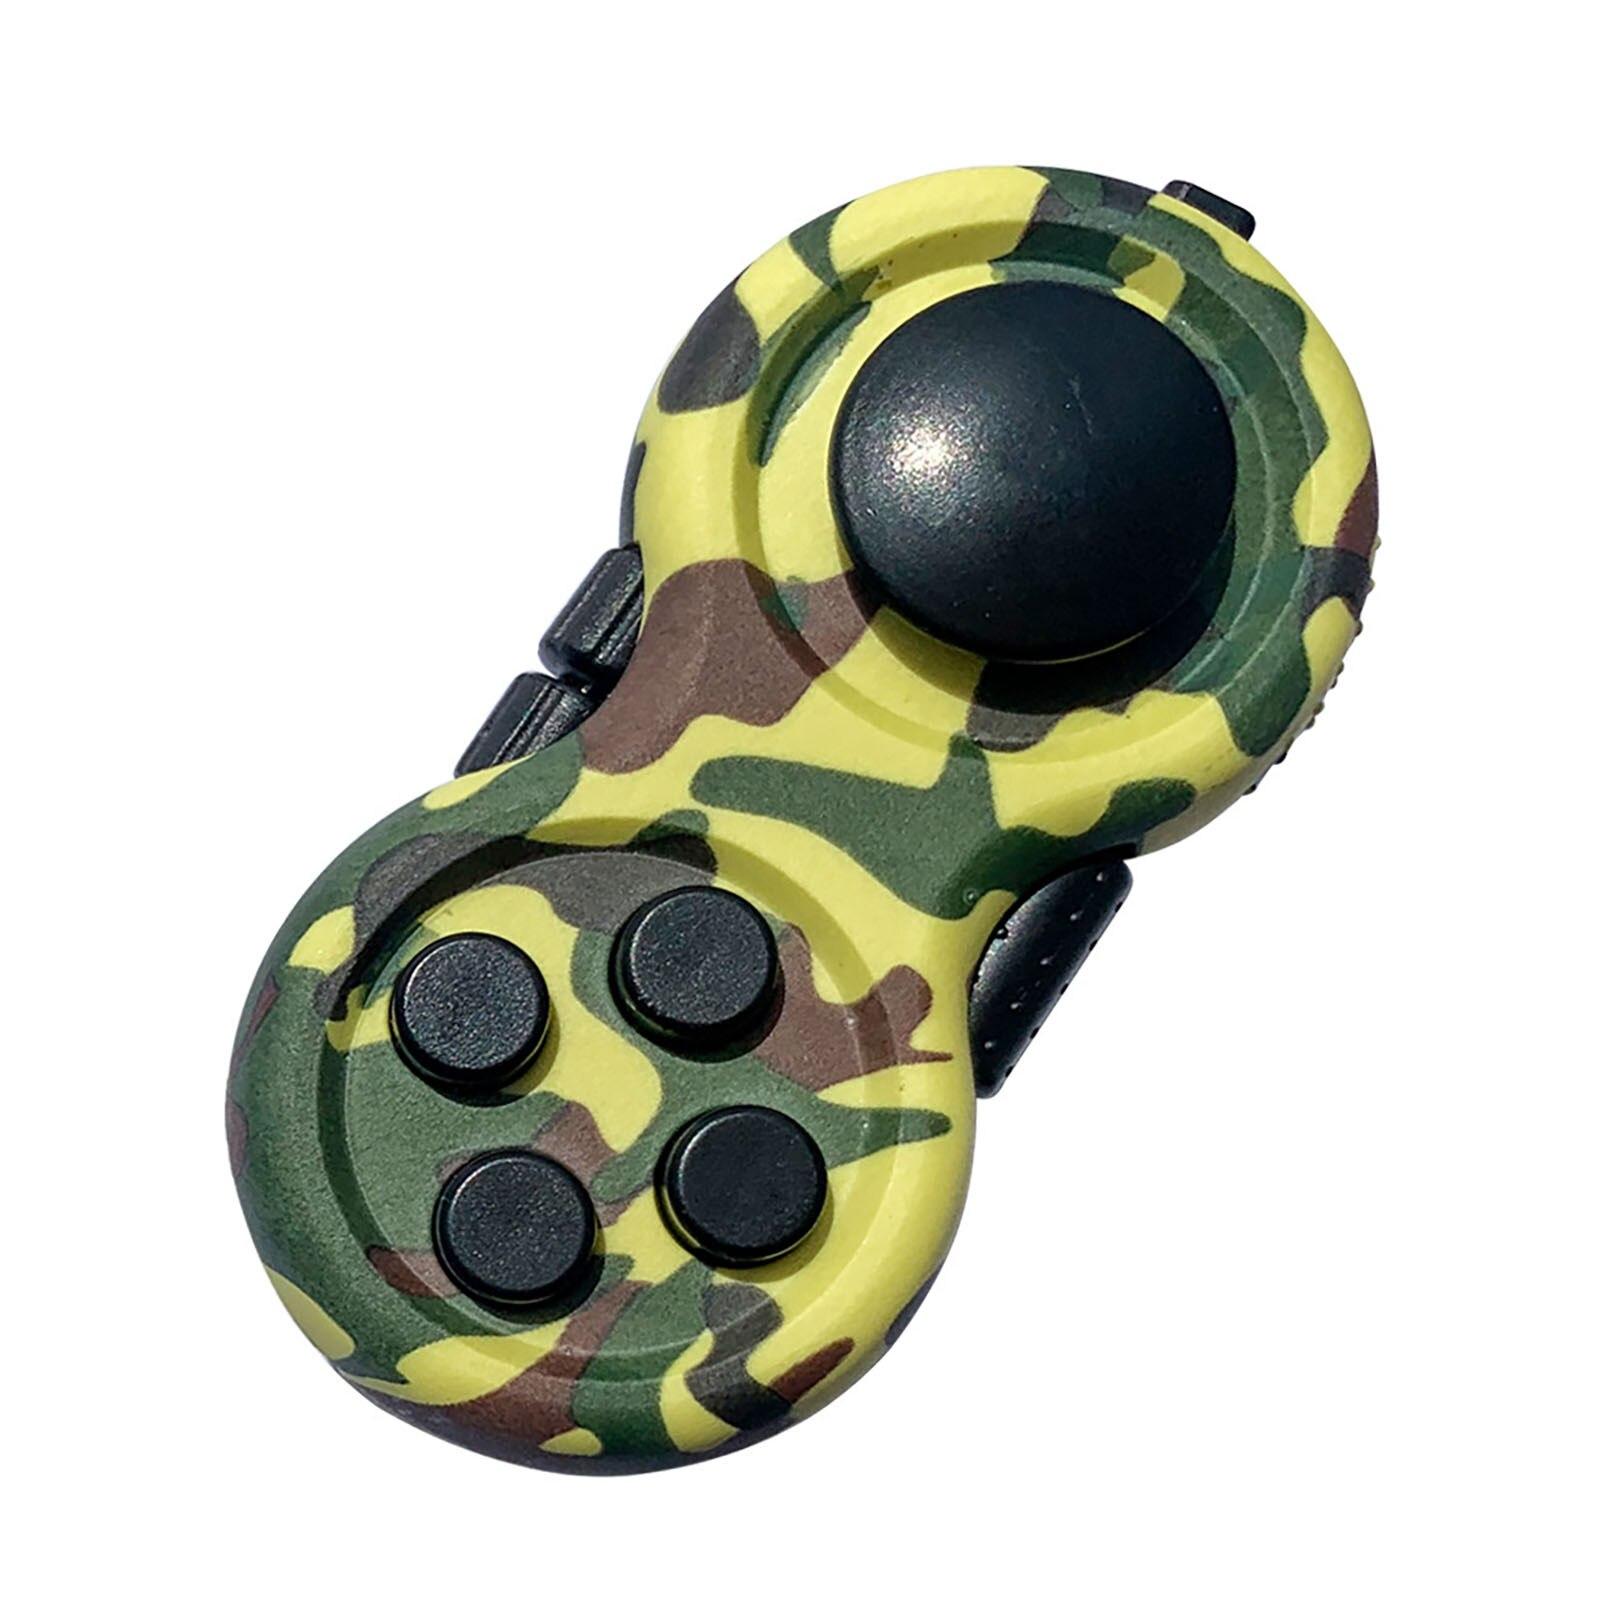 fidget pad handle controller type 2 fidget toy 4057 - Wacky Track